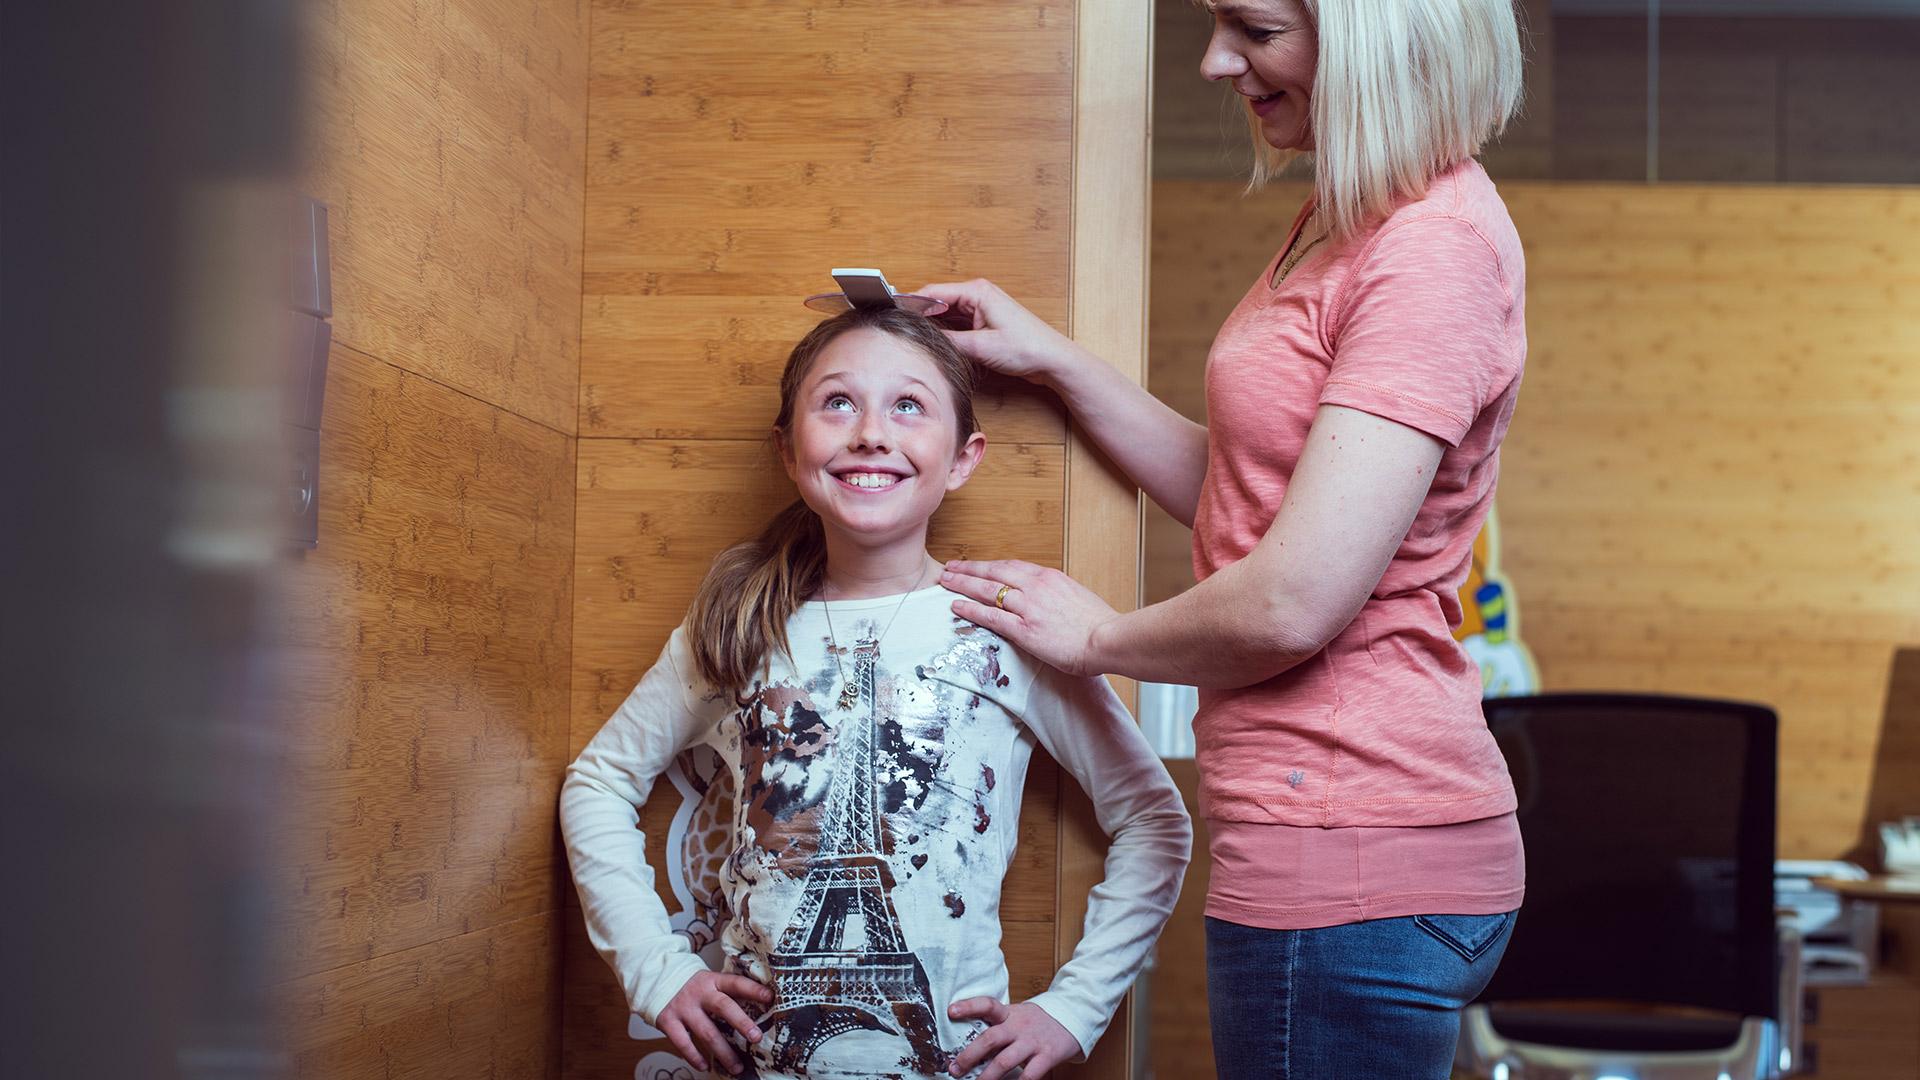 Dr. Grässl Sportarzt Kinder